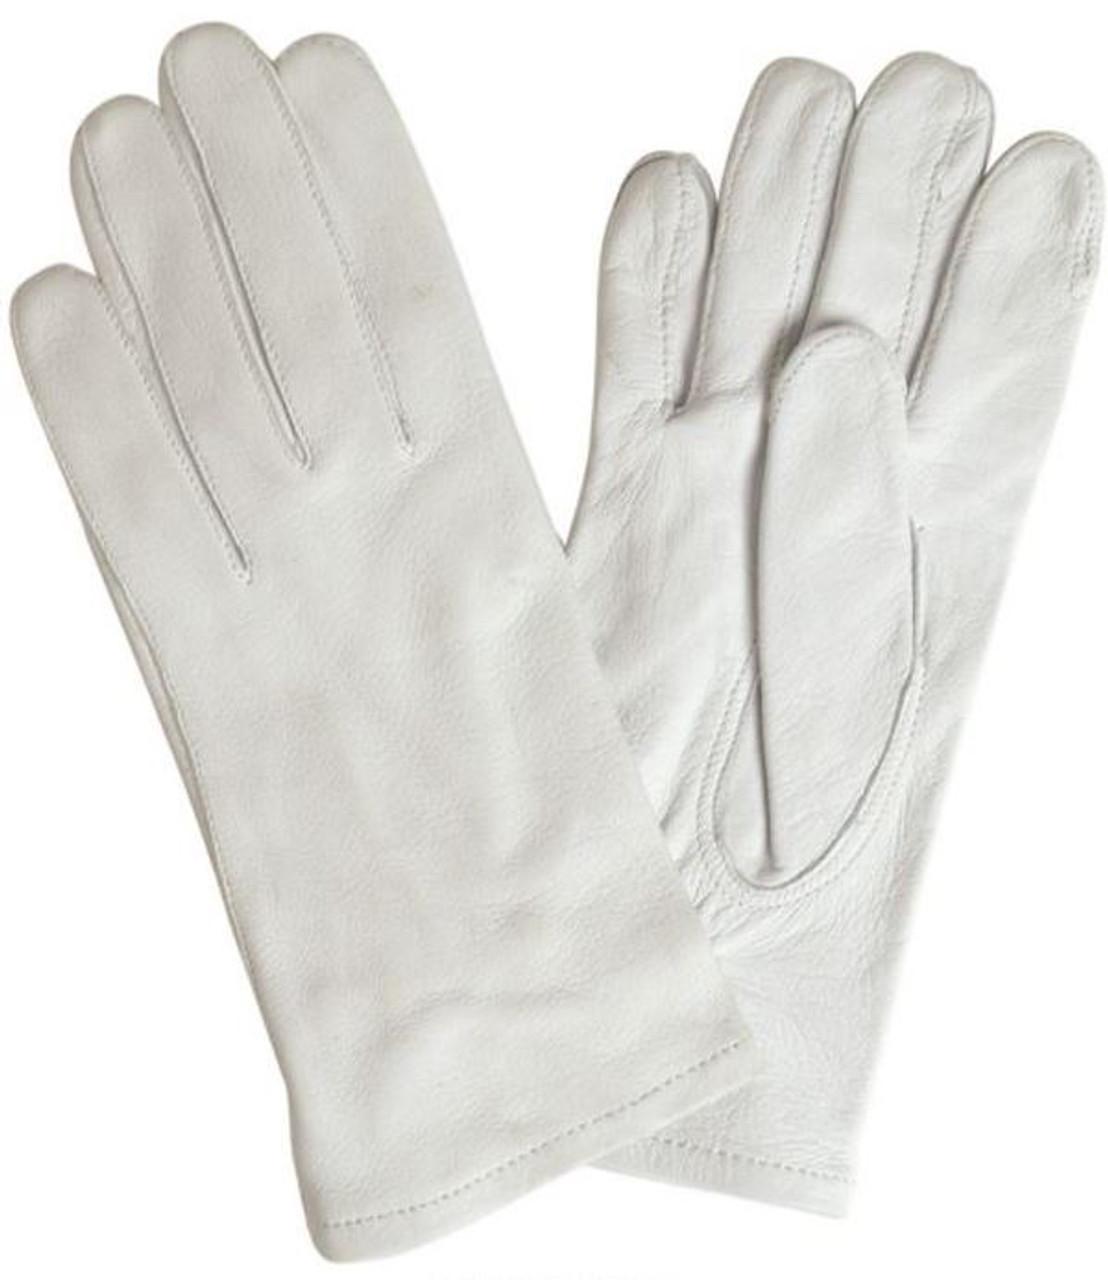 BW Wachbataillon White Leather Parade Gloves